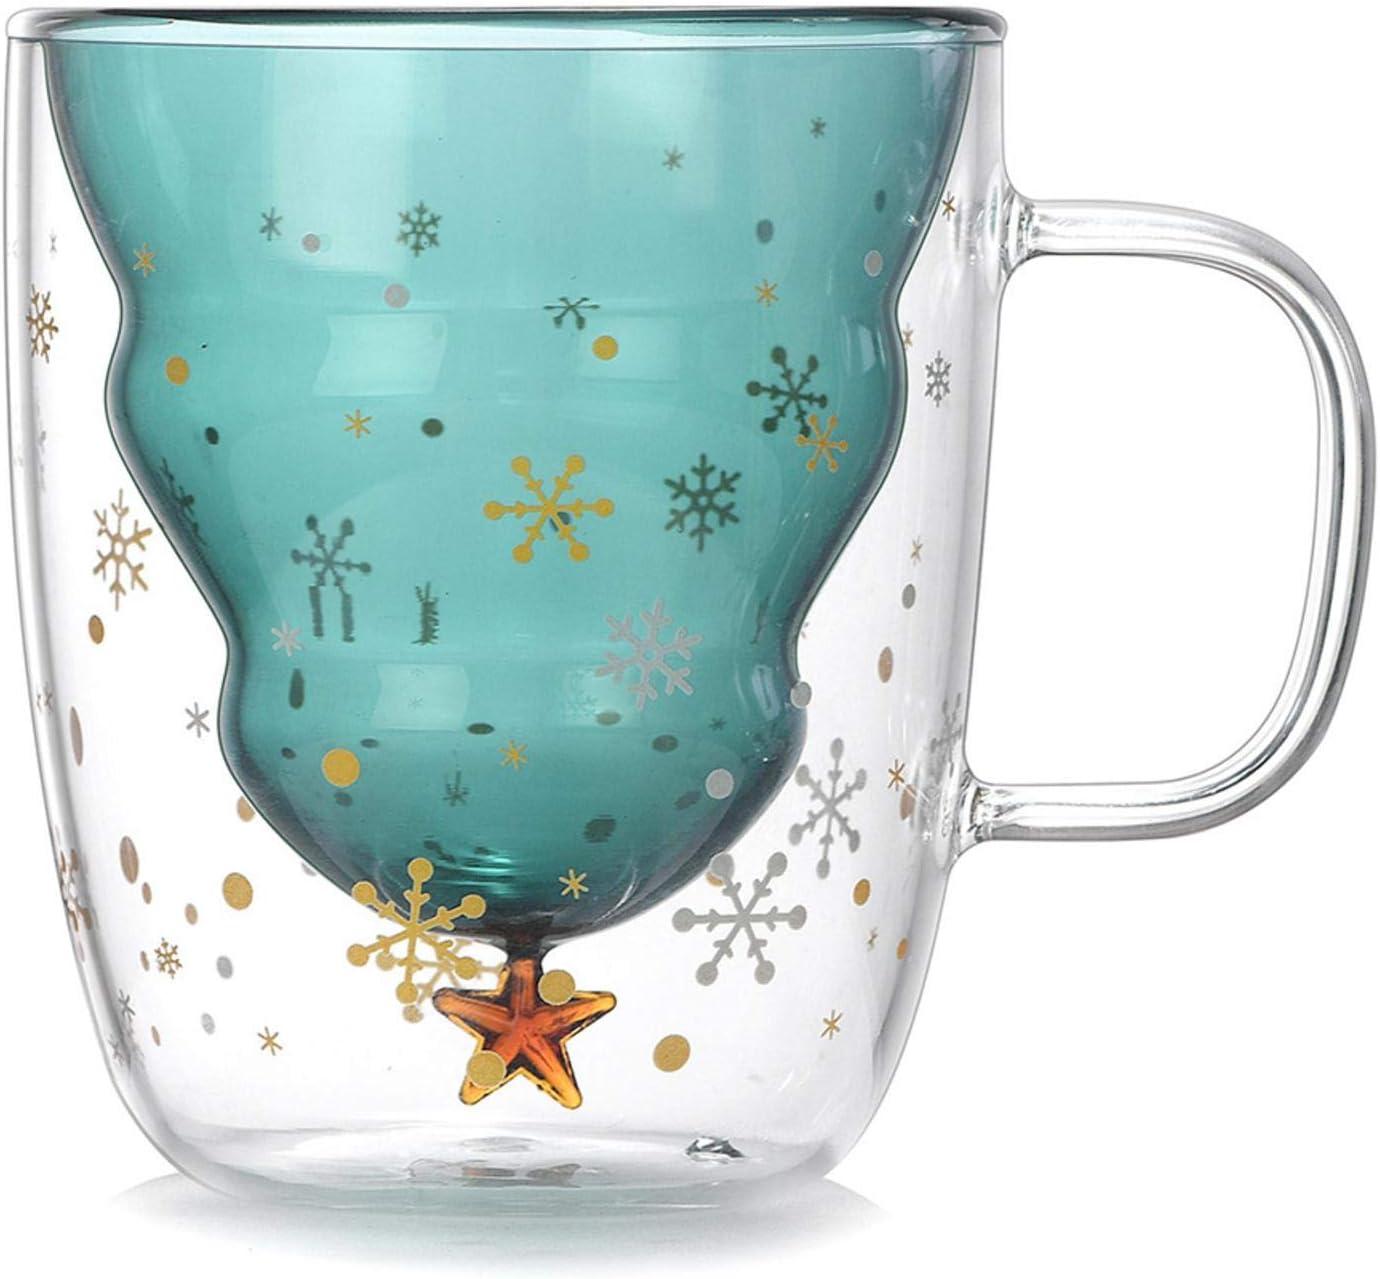 Amazon Com Christmas Tree Glass Cup Merry Christmas Tree With Star Double Wall Glass Coffee Mug For Tea Milk Fruit Juice 8 45oz Kitchen Dining